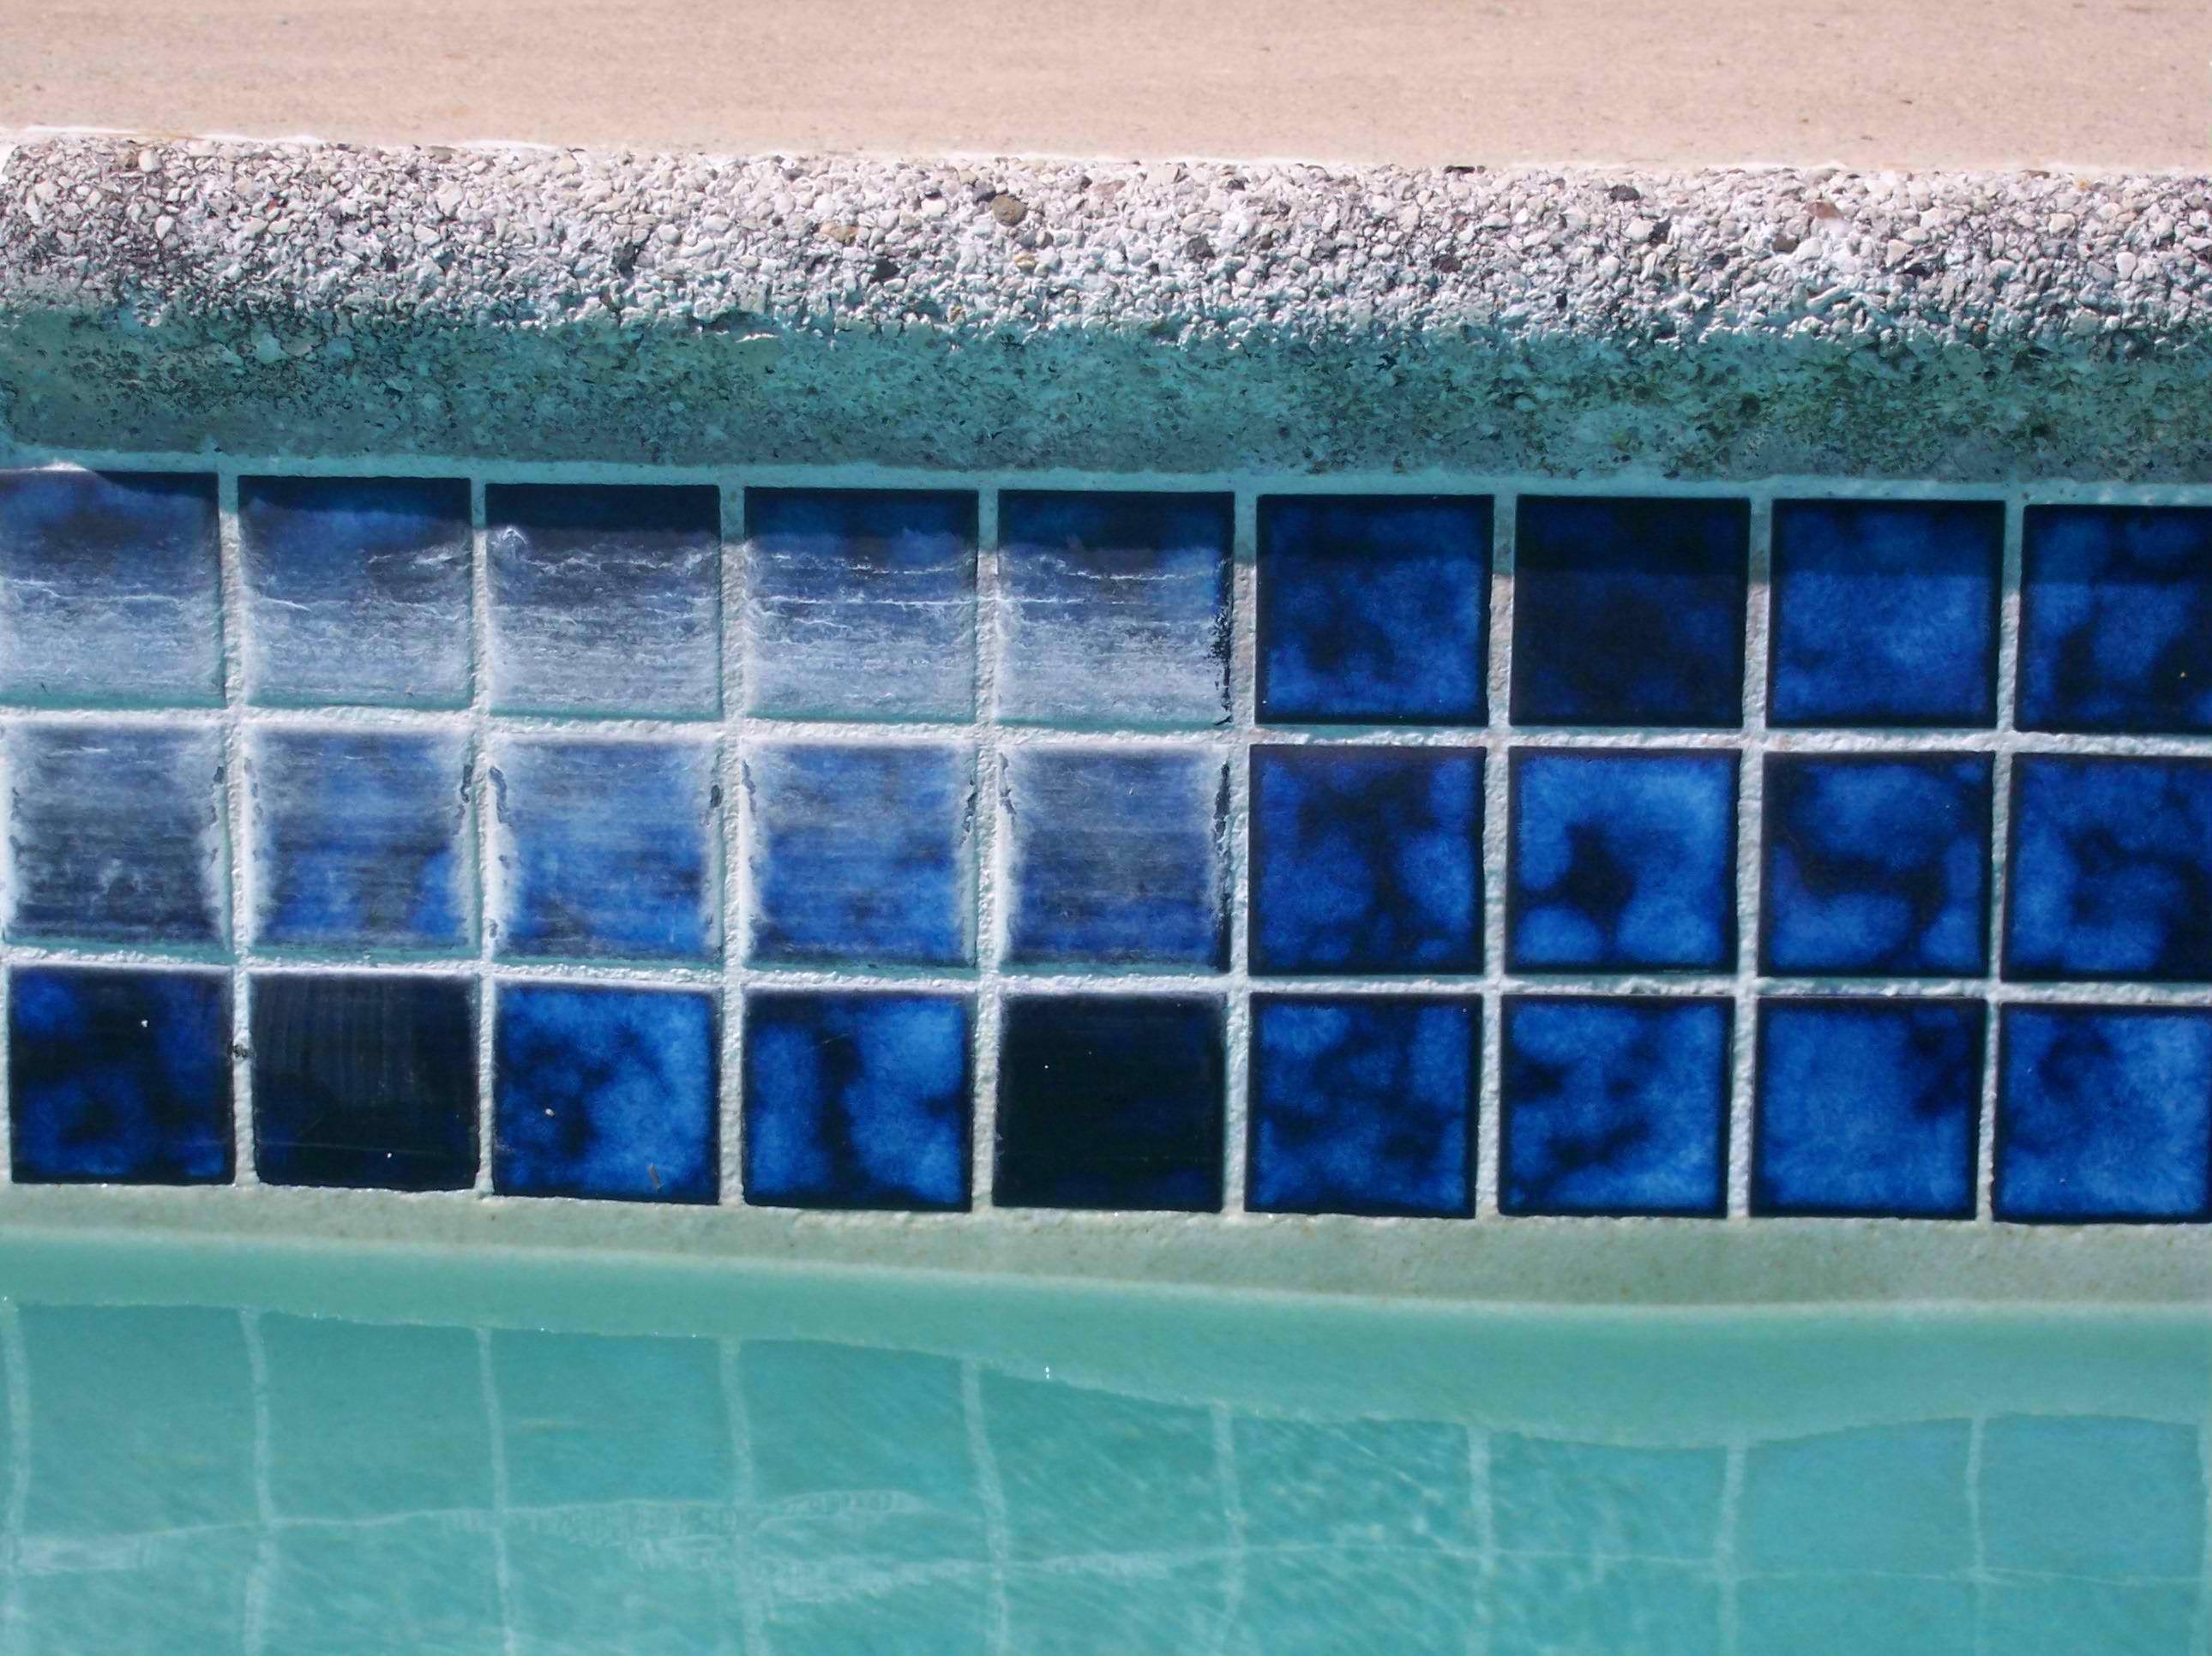 Swimming Pool Tile Pools And Decks Swimming Pool Tiles